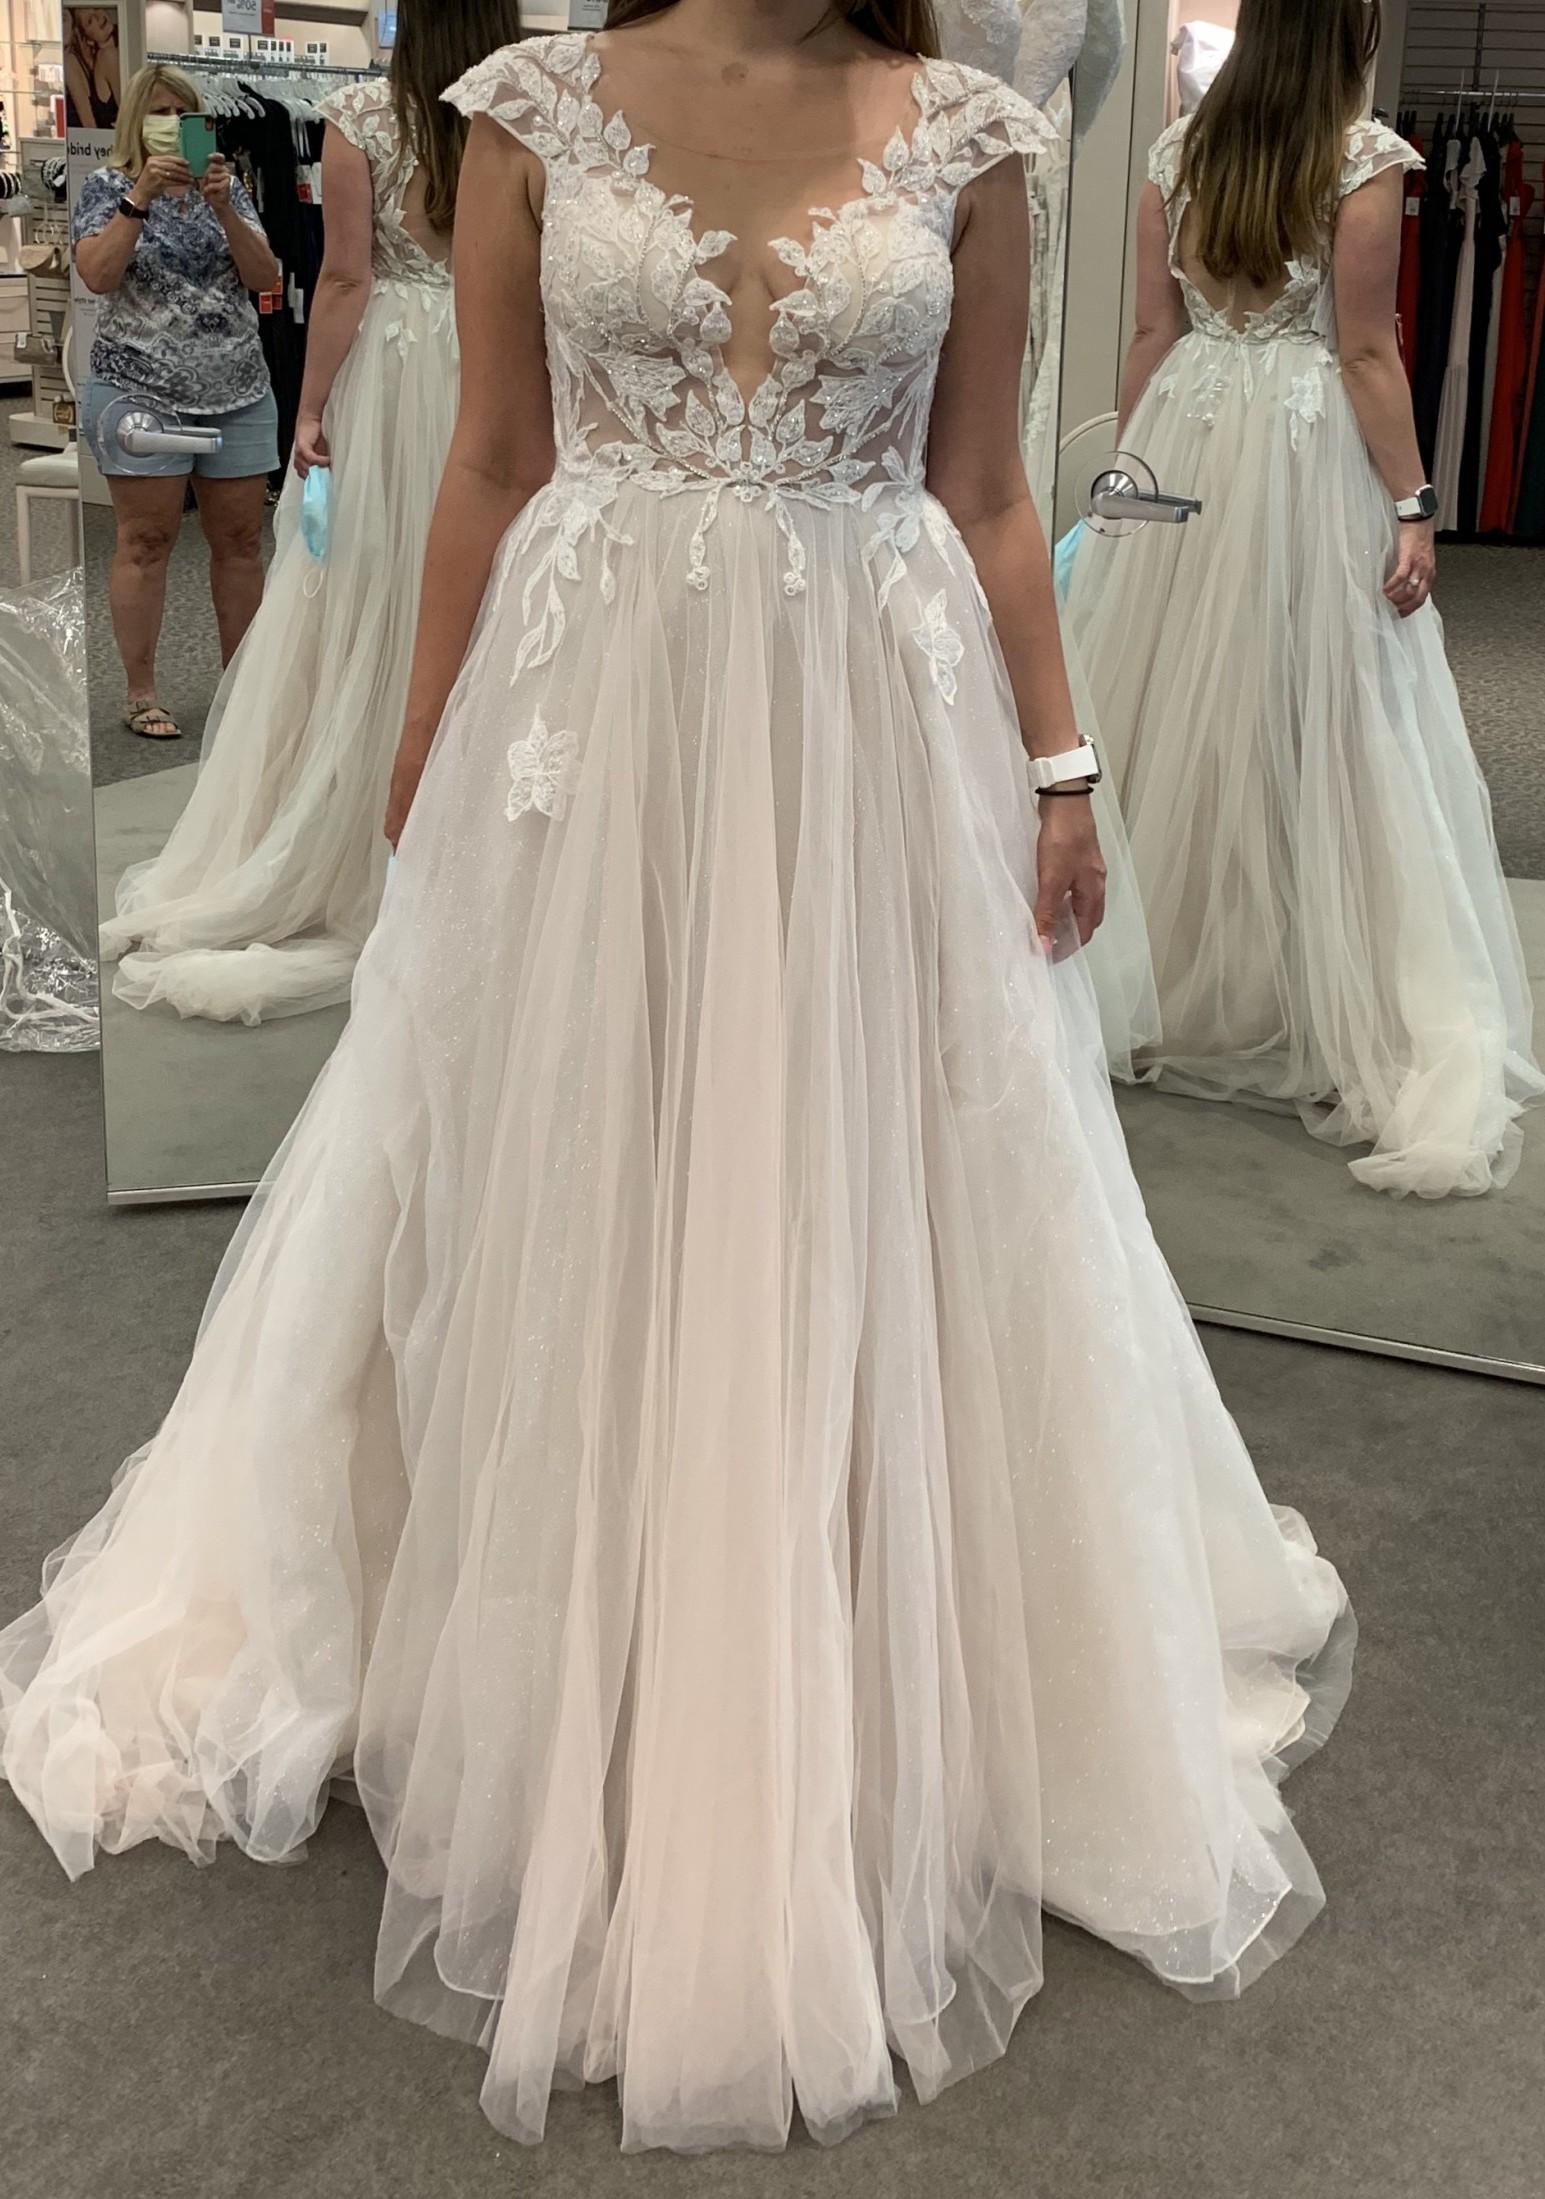 Galina Signature Illusion Cap Sleeve Lace Appliqued Wedding Dress